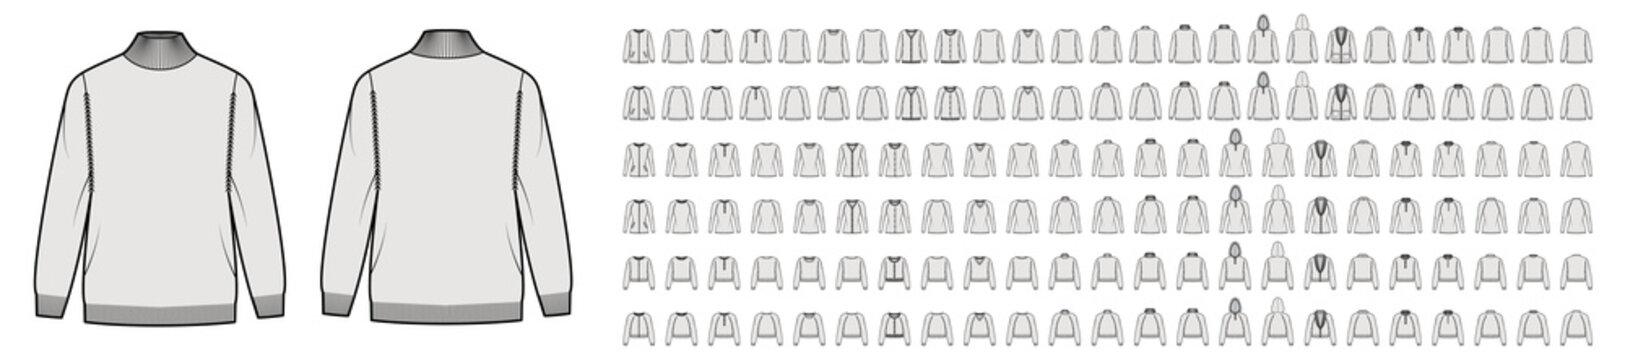 Set of Sweaters, cardigans technical fashion illustration with hood long raglan sleeves, waist, hip length, knit rib trim. Flat jumpers apparel front, back grey color. Women men unisex CAD mockup